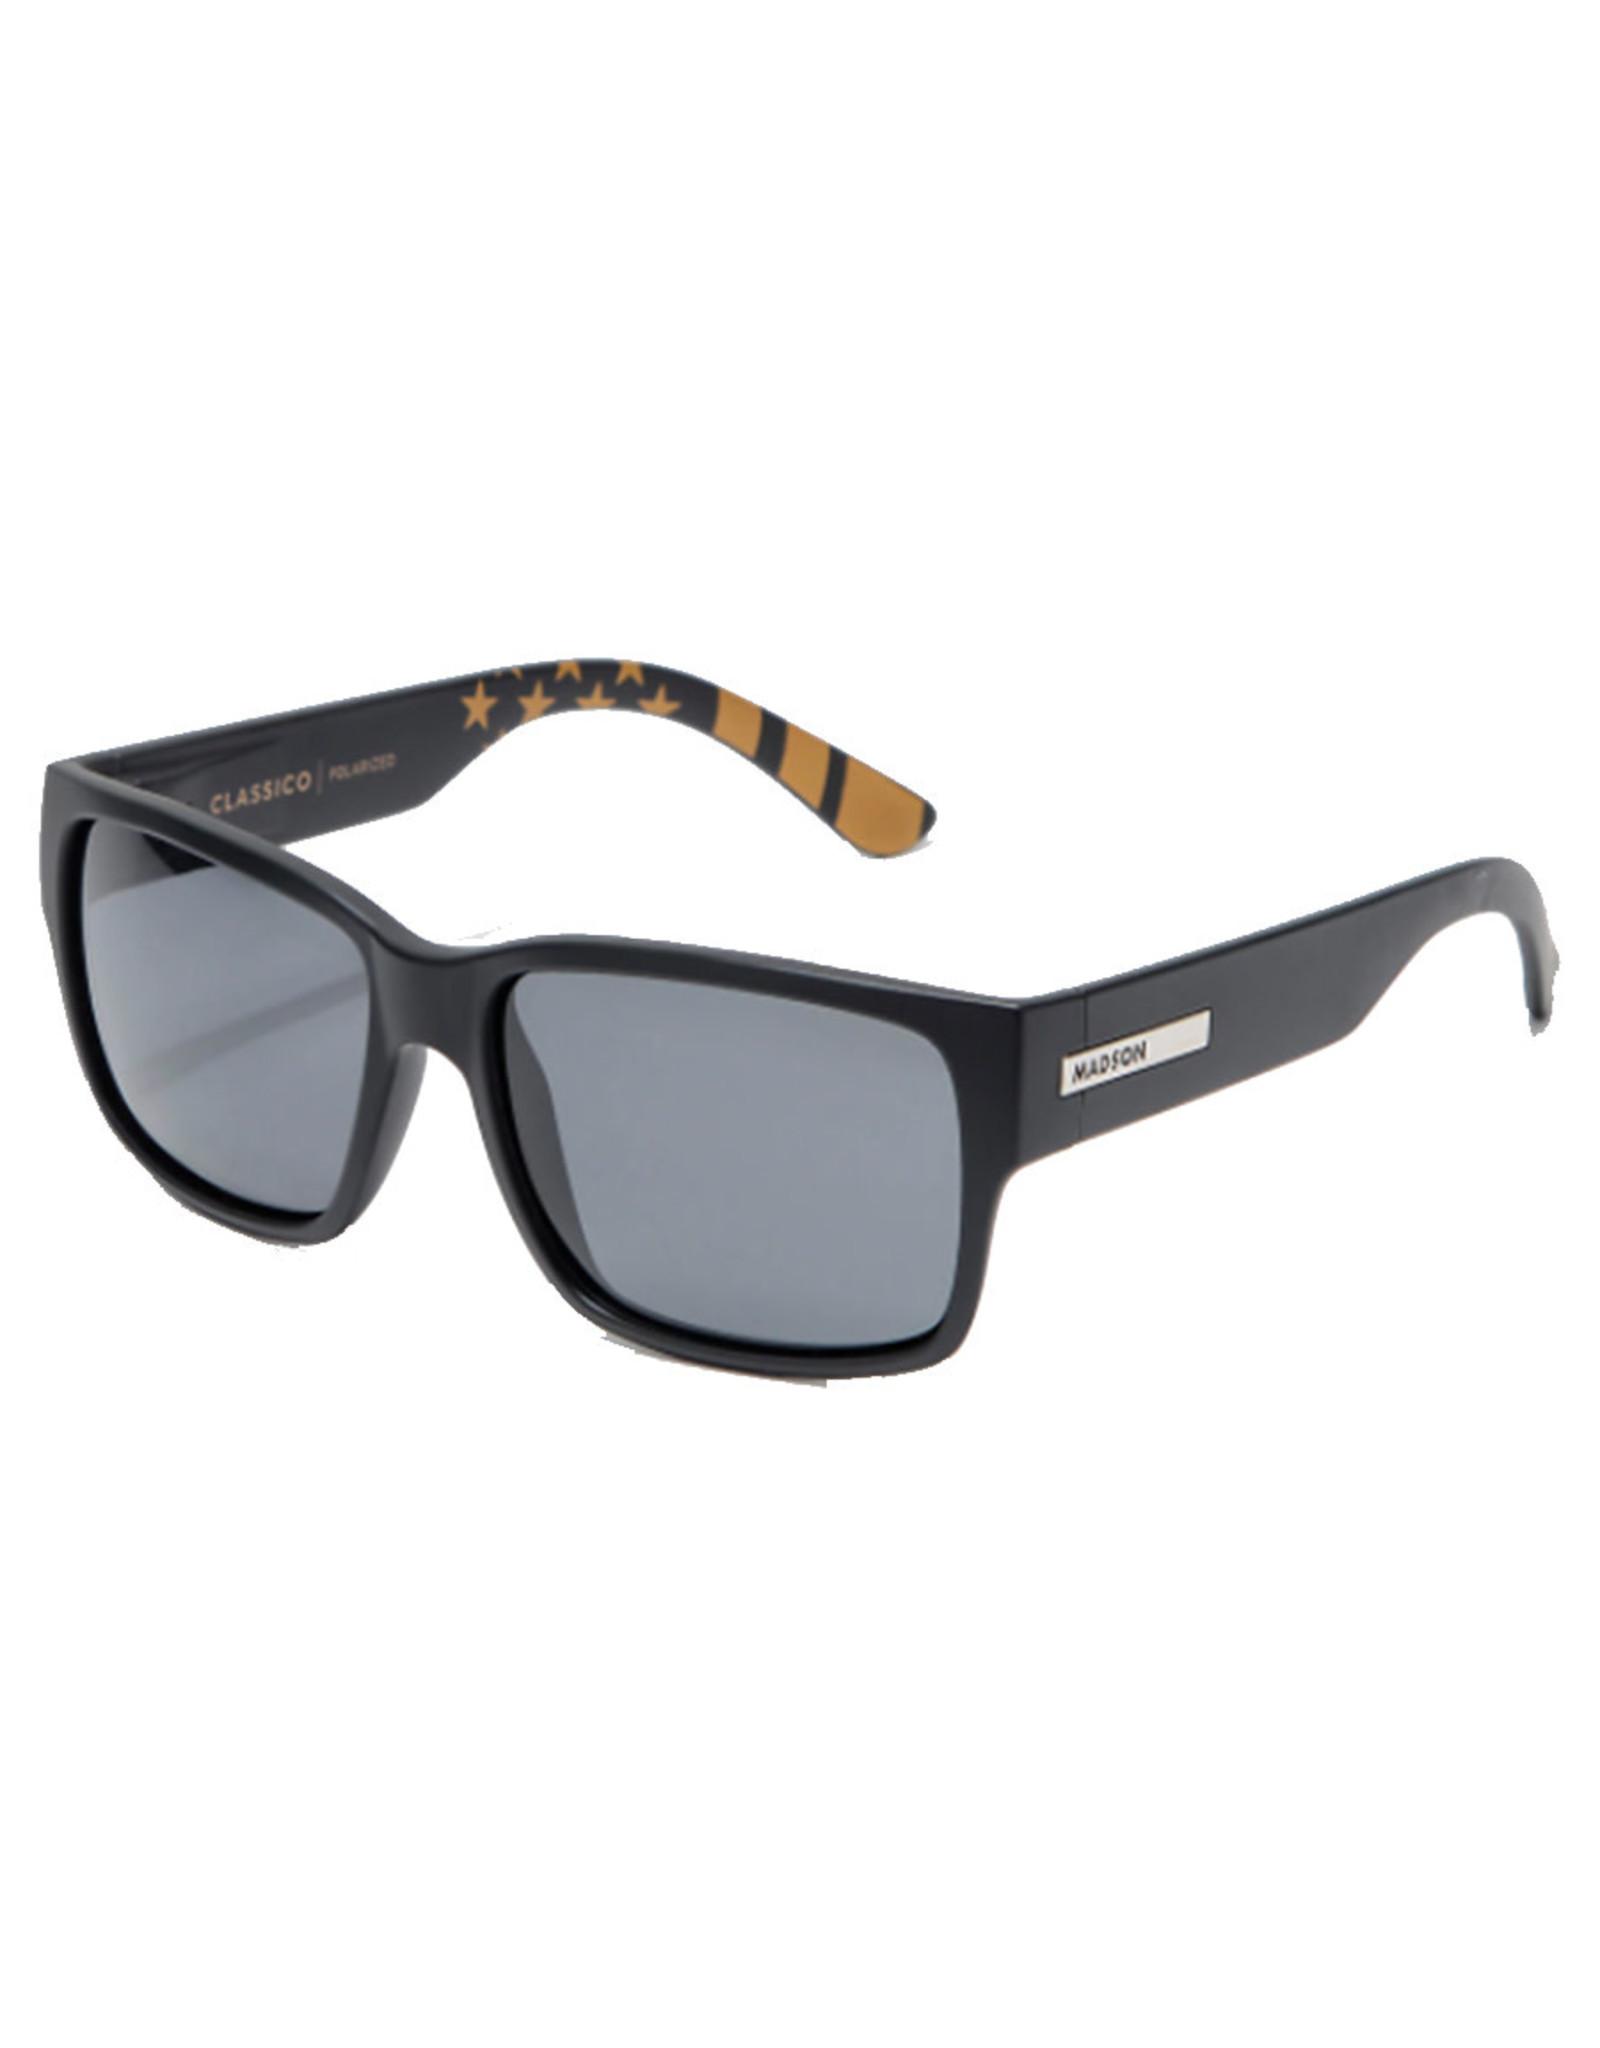 Madson Madson Sunglasses Classico (Black Matte Flag/Grey Polarized Lens)